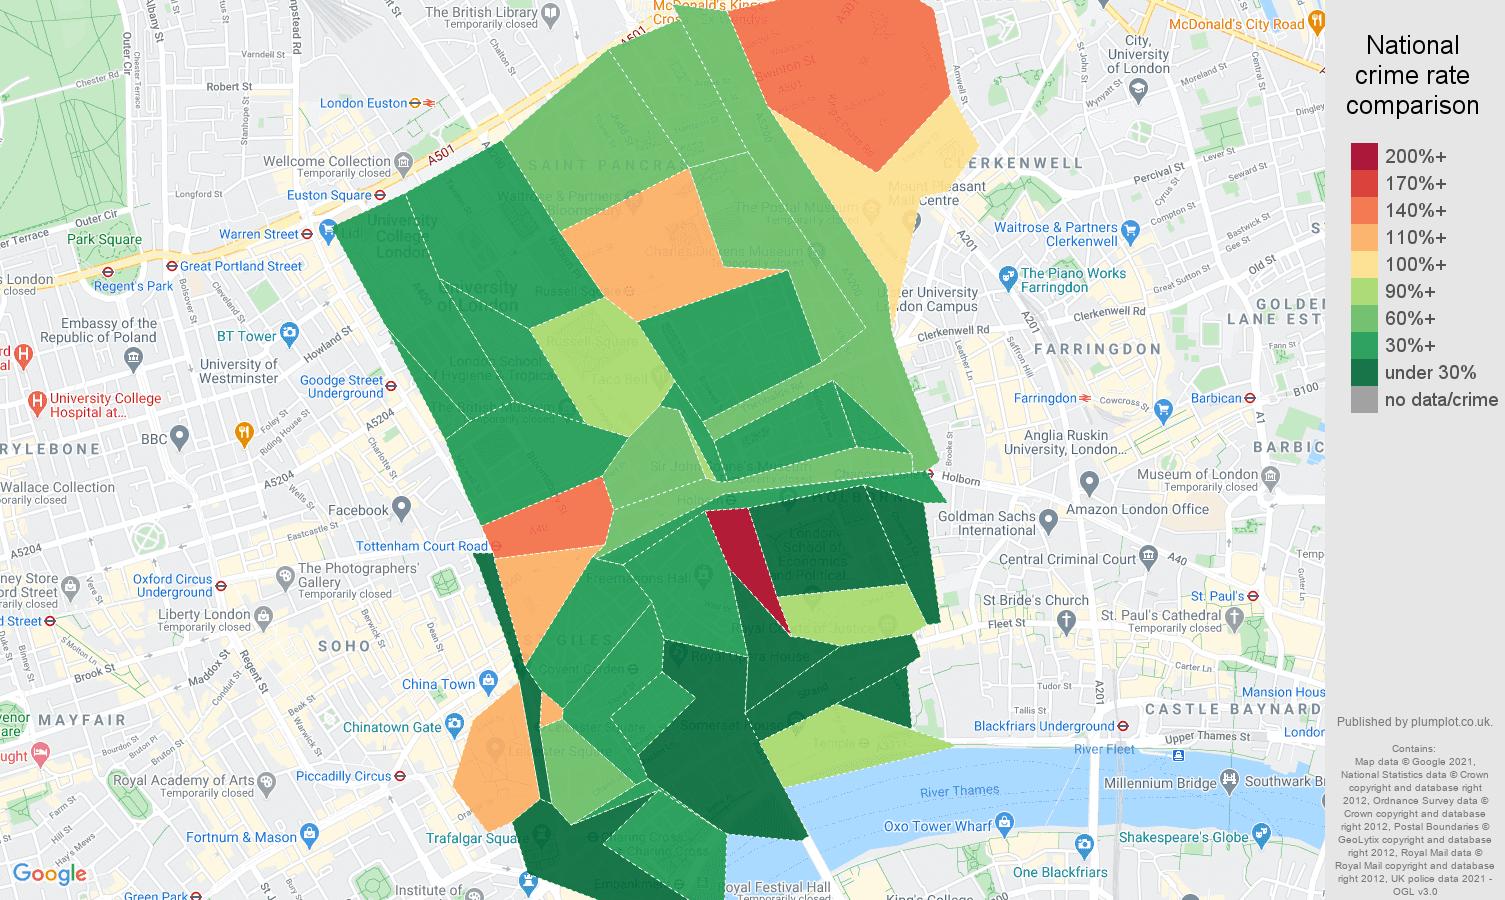 Western Central London burglary crime rate comparison map